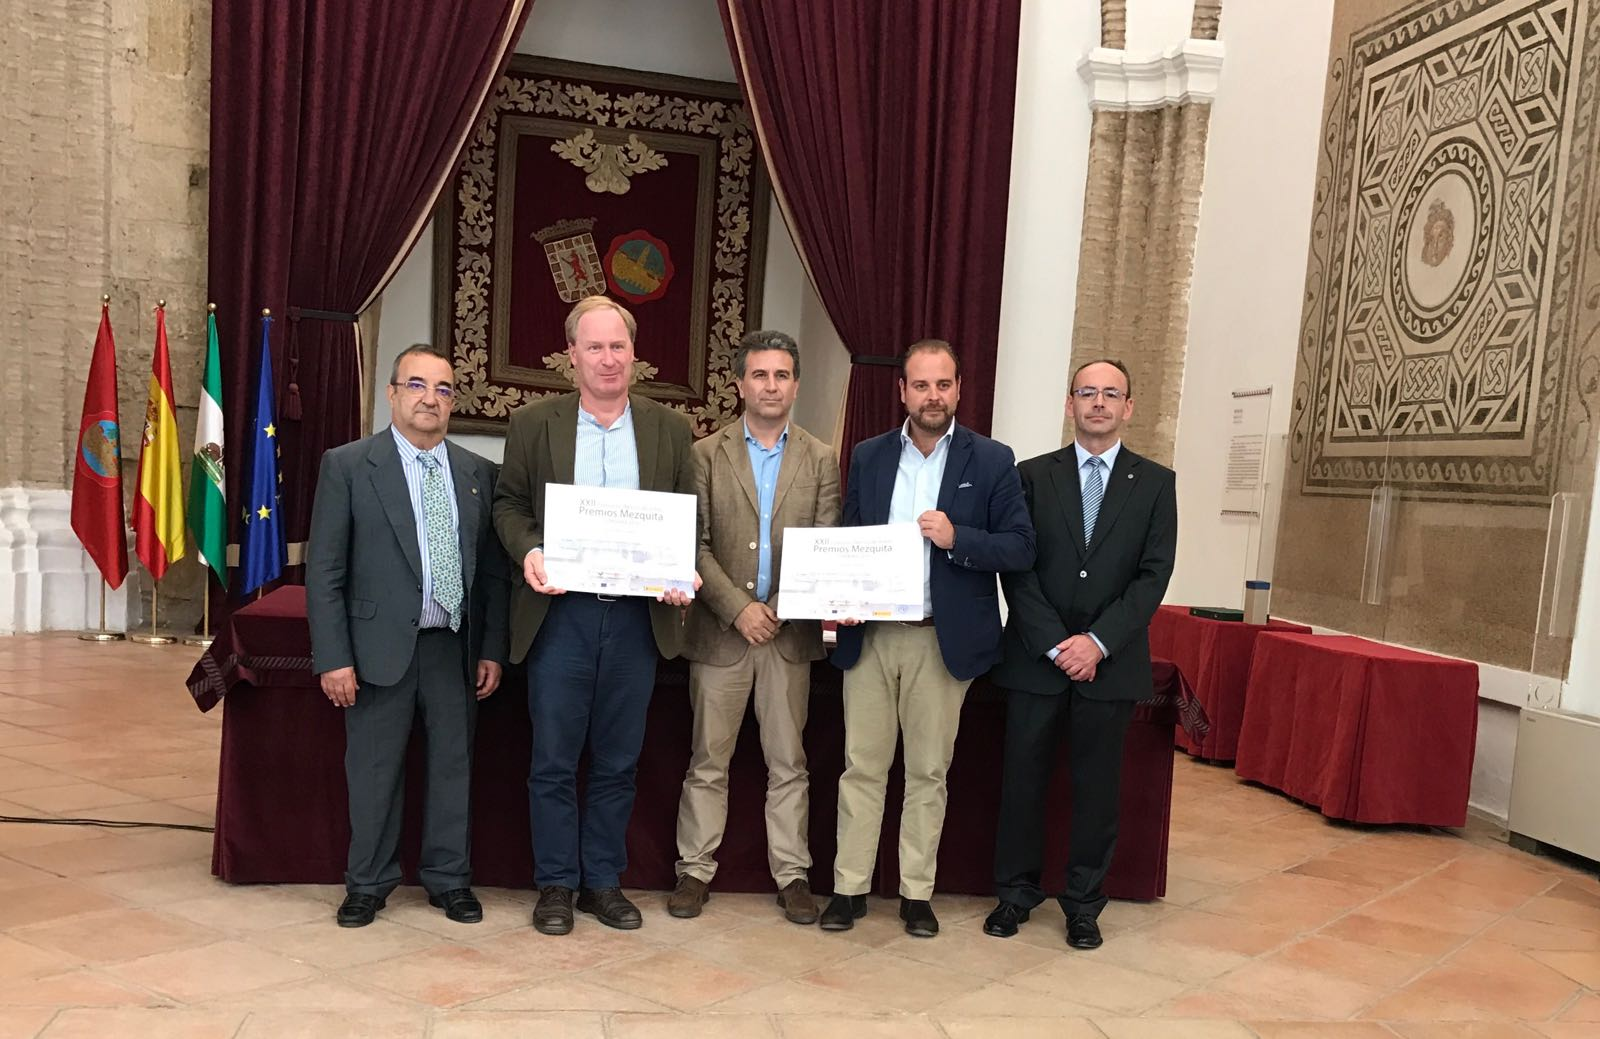 premios-mezquita-jurado